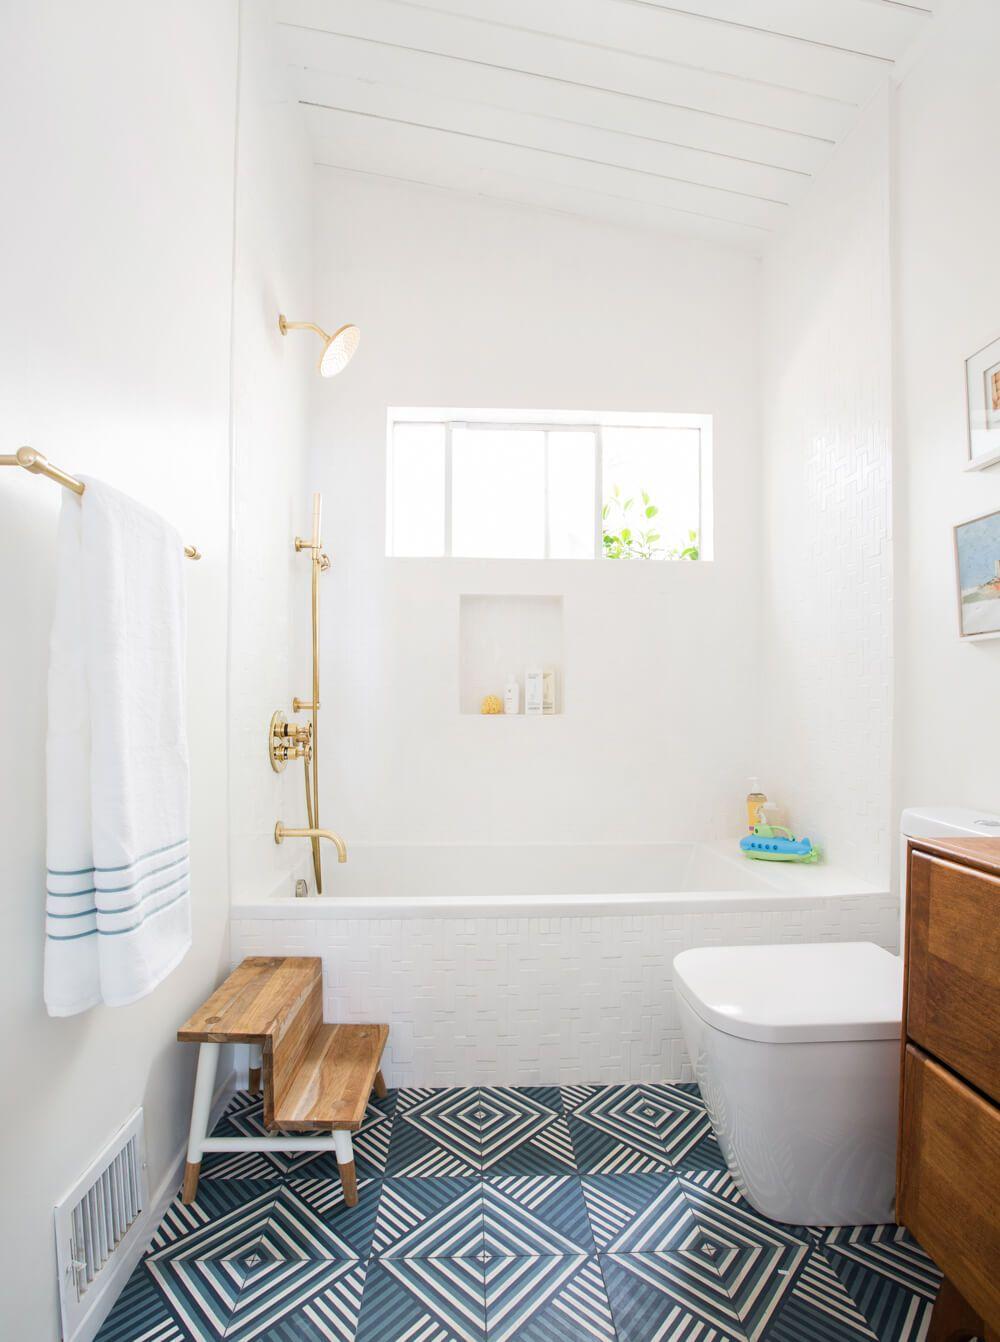 Tolson Thermostatic Tub Shower Set | Shower tub, Em henderson and ...